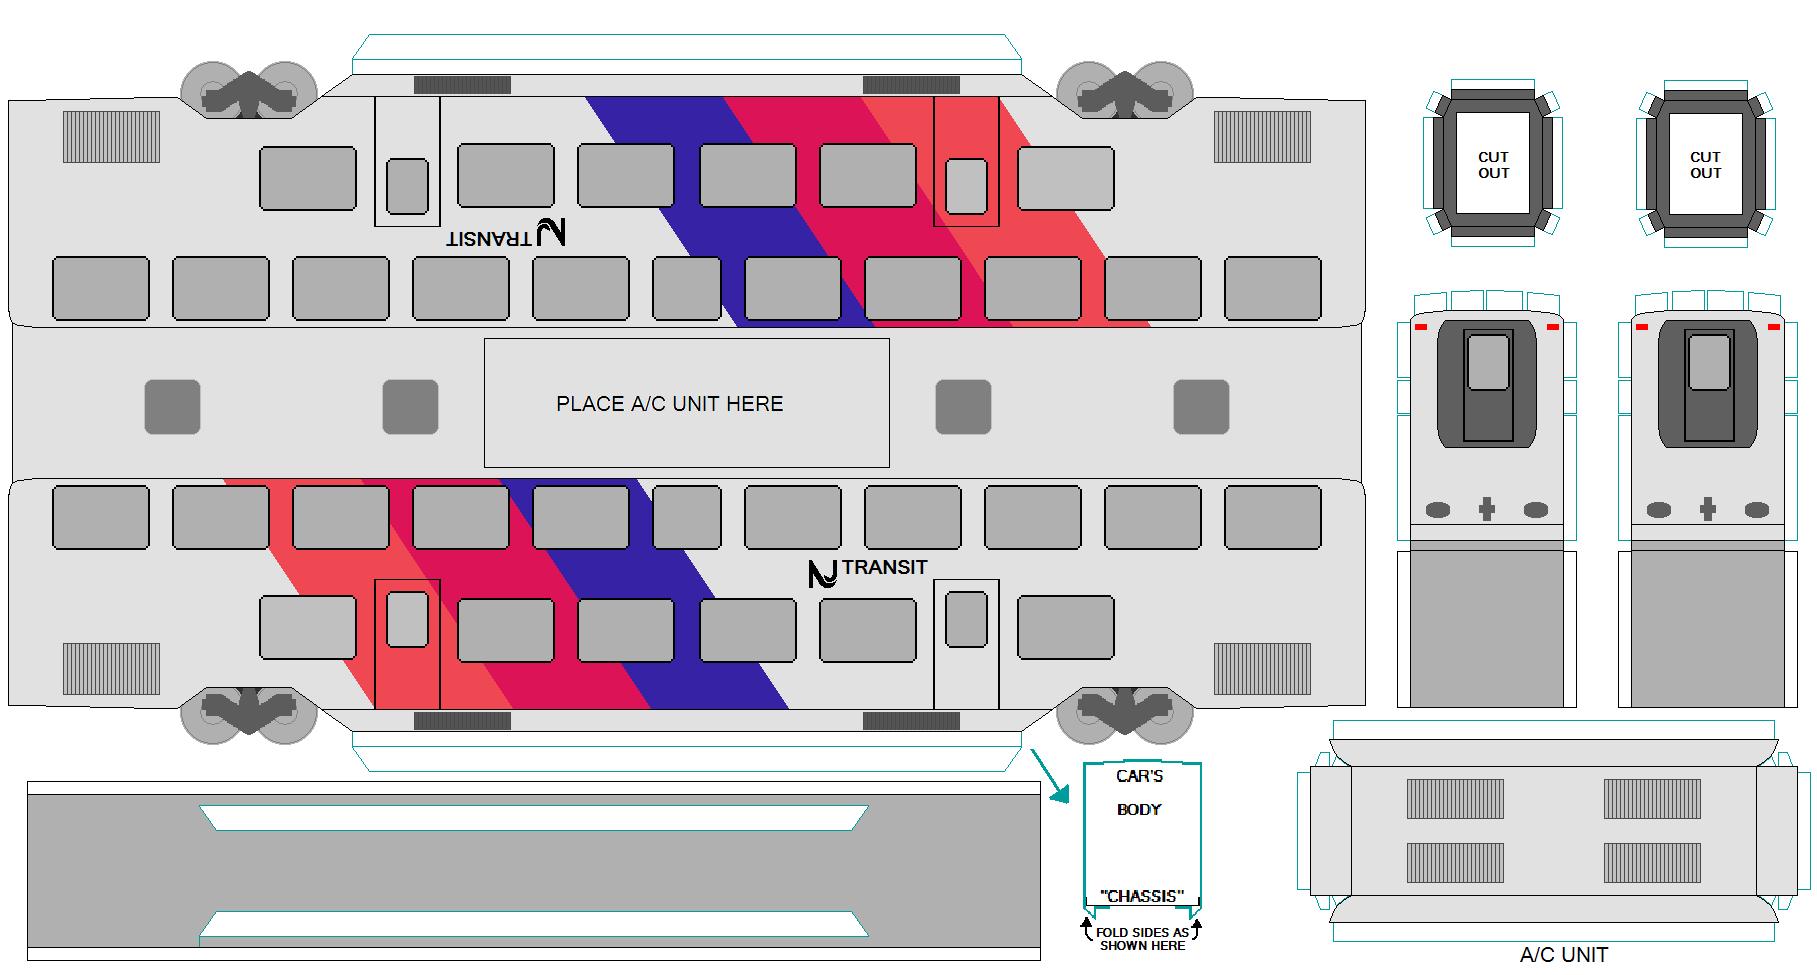 NewJersey__livery1__bi_level_train_car.PNG